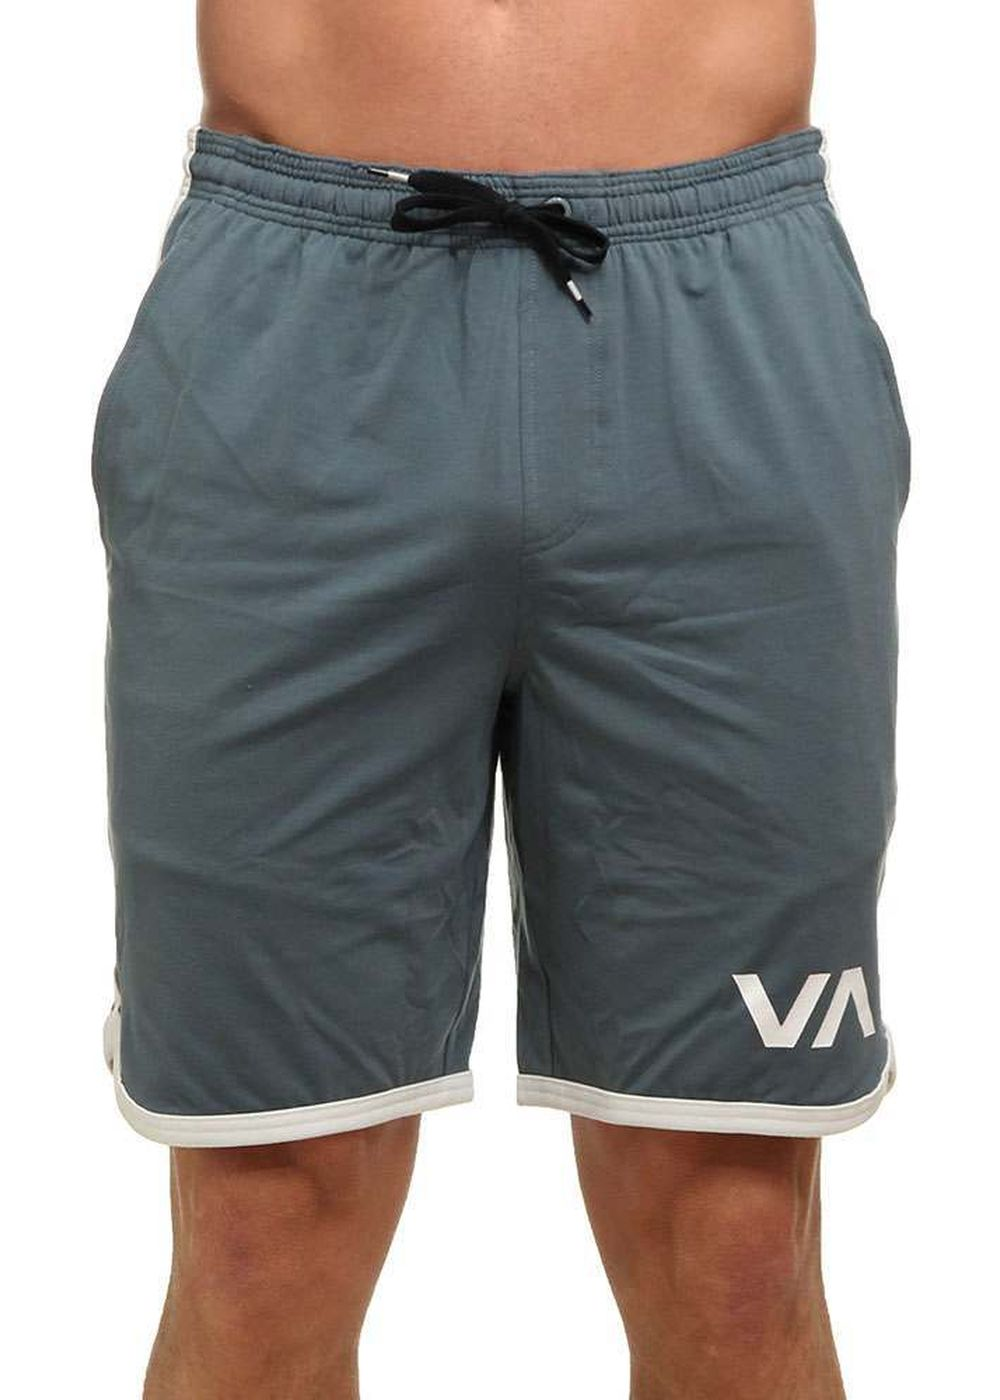 rvca-va-sport-shorts-stormy-blue